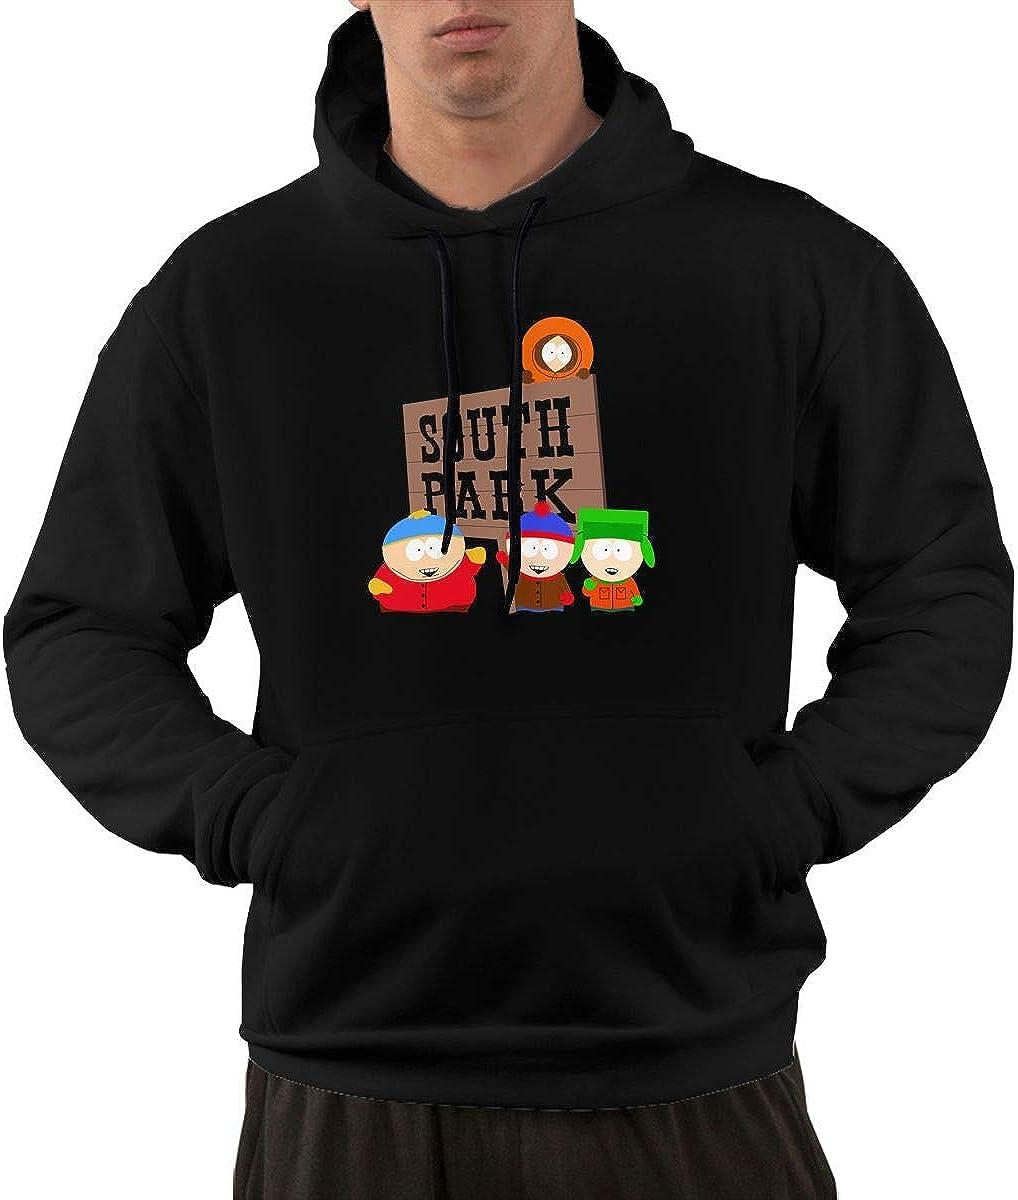 AlbertV Men's South Park Hoodies Black Finally popular brand Pocket with Sweater Popular